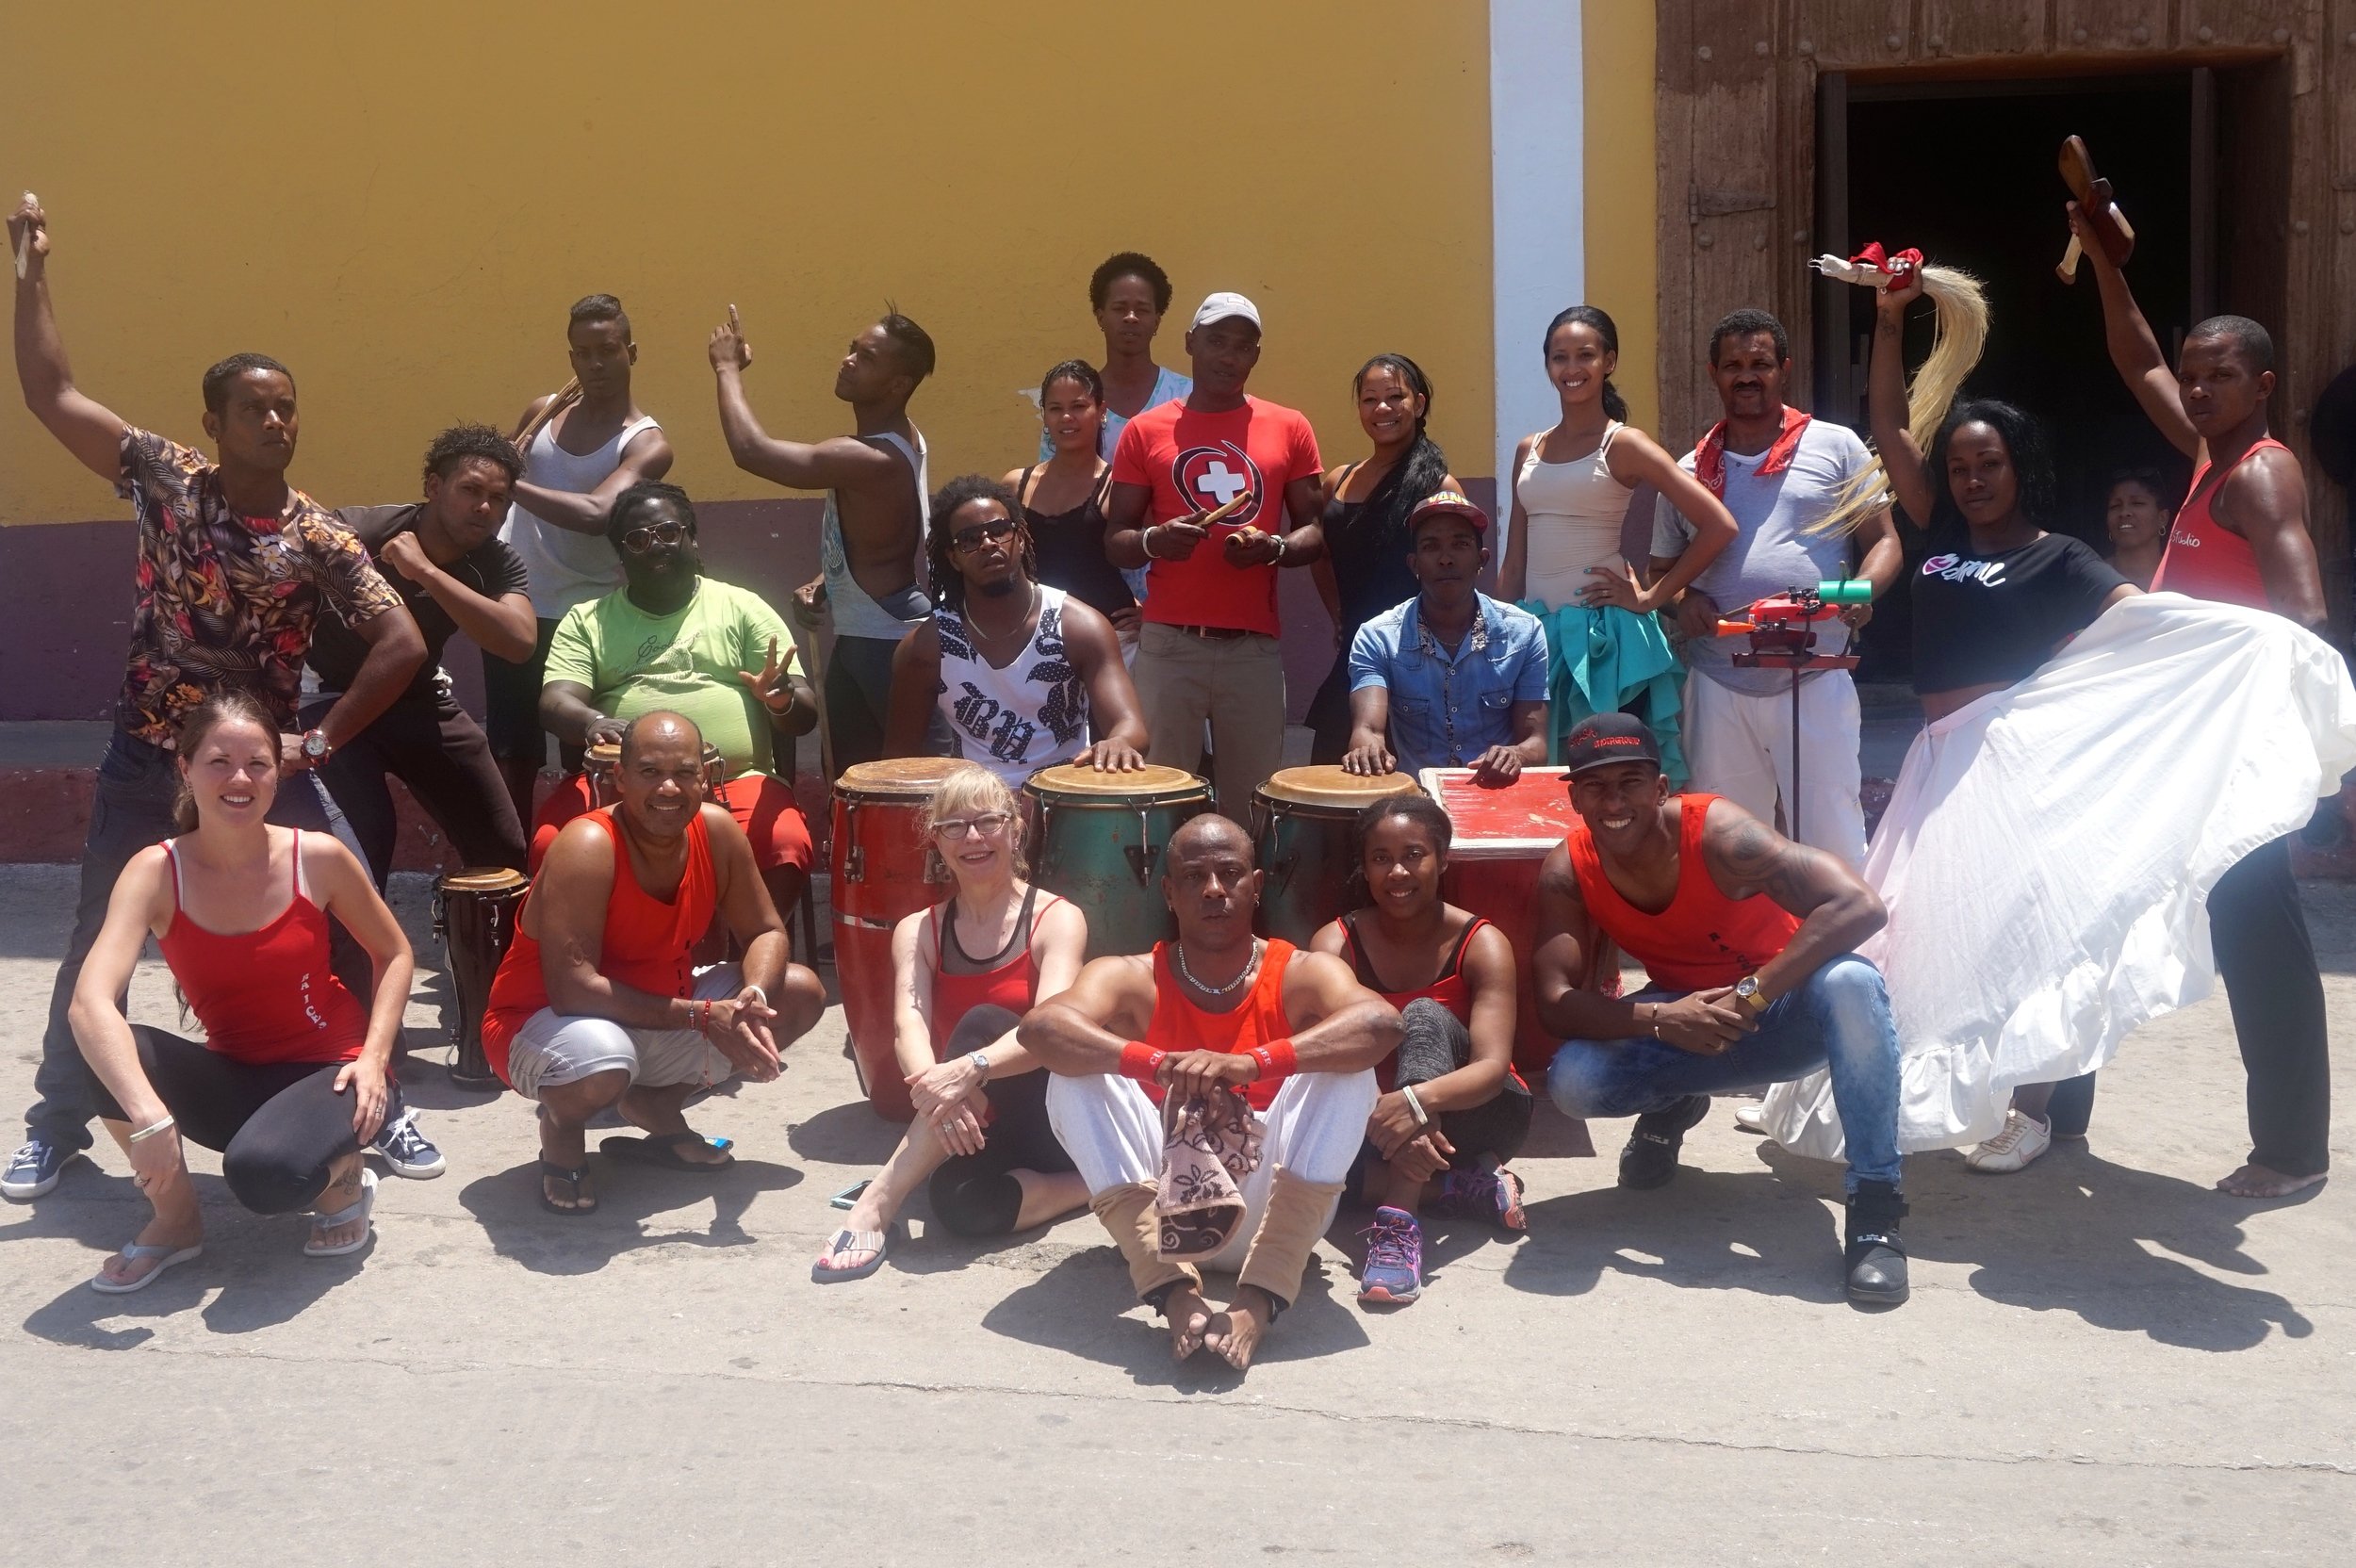 Dr. Brown with members of Salsa Underground, Yoel Marrero (Founder and Director, Salsa Underground), and Lazaro Monteagudo (Dancer, Yoruba Andabo)—Trinidad, Cuba